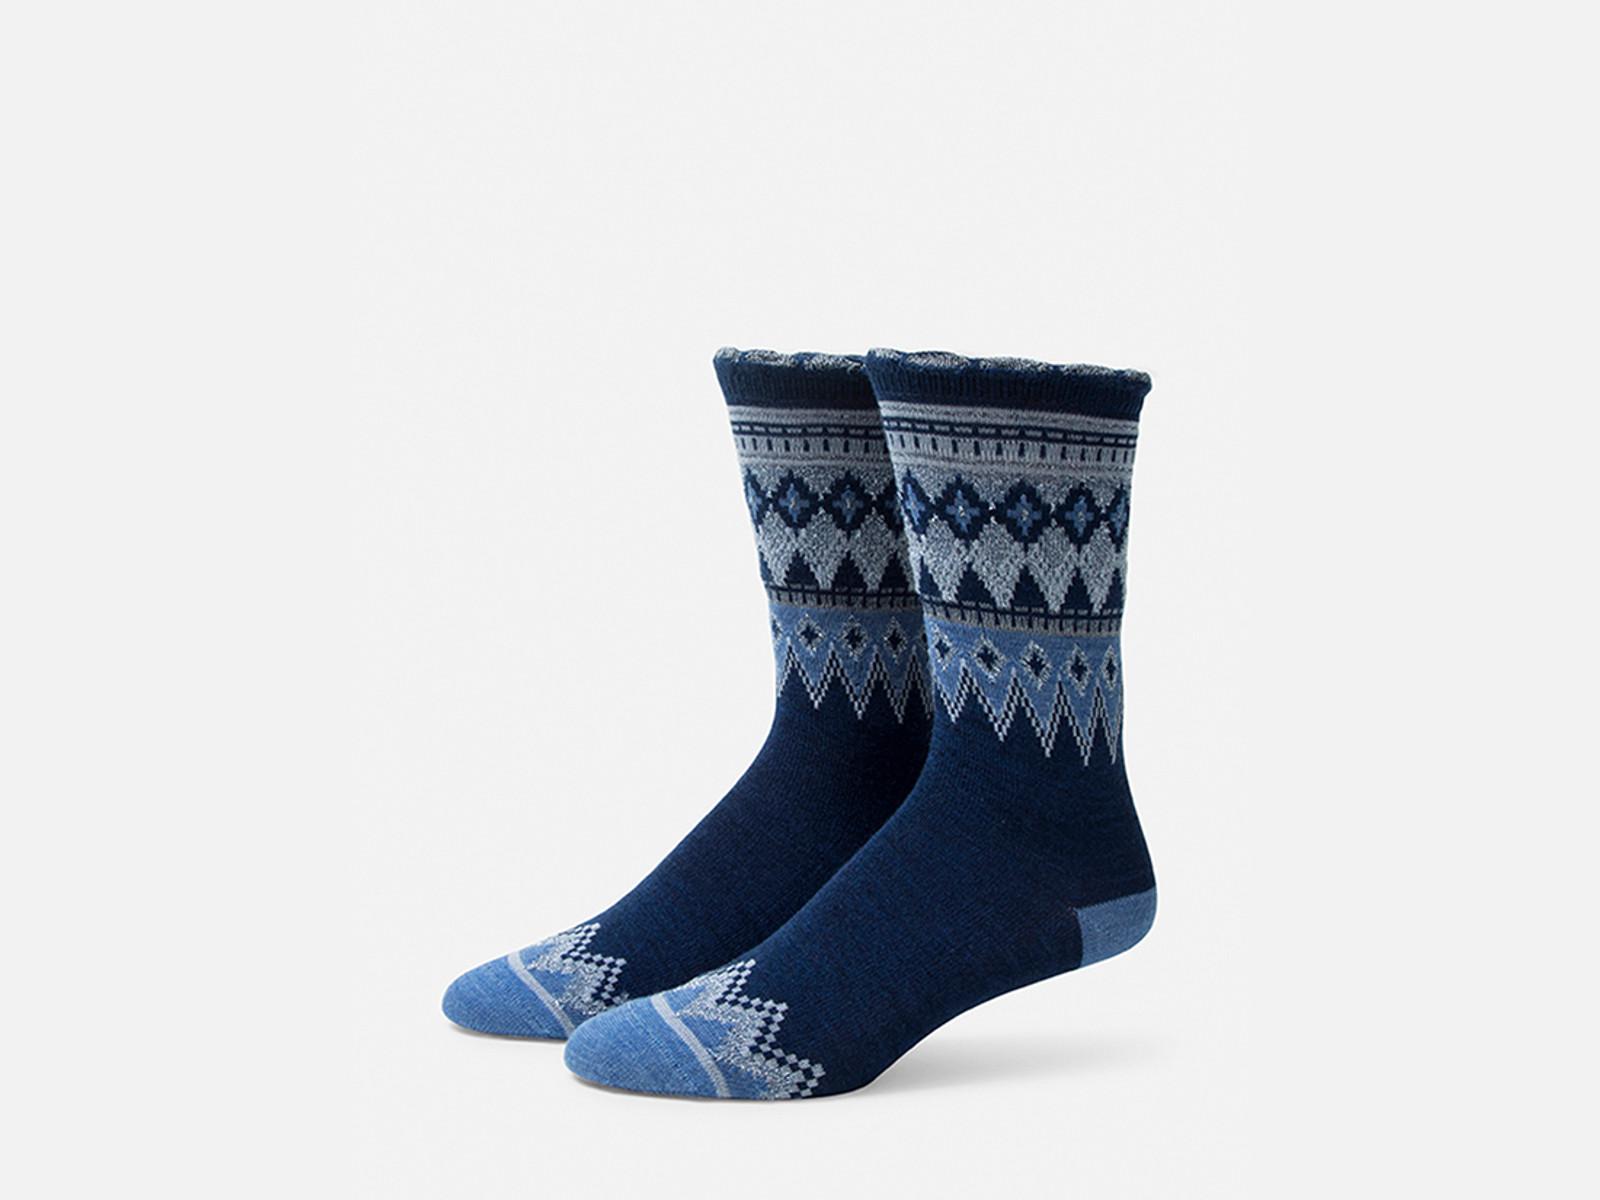 B.ELLA Everleigh Sparkle Fairisle Socks, Ladies' One Size - Navy (BE0325-02030)